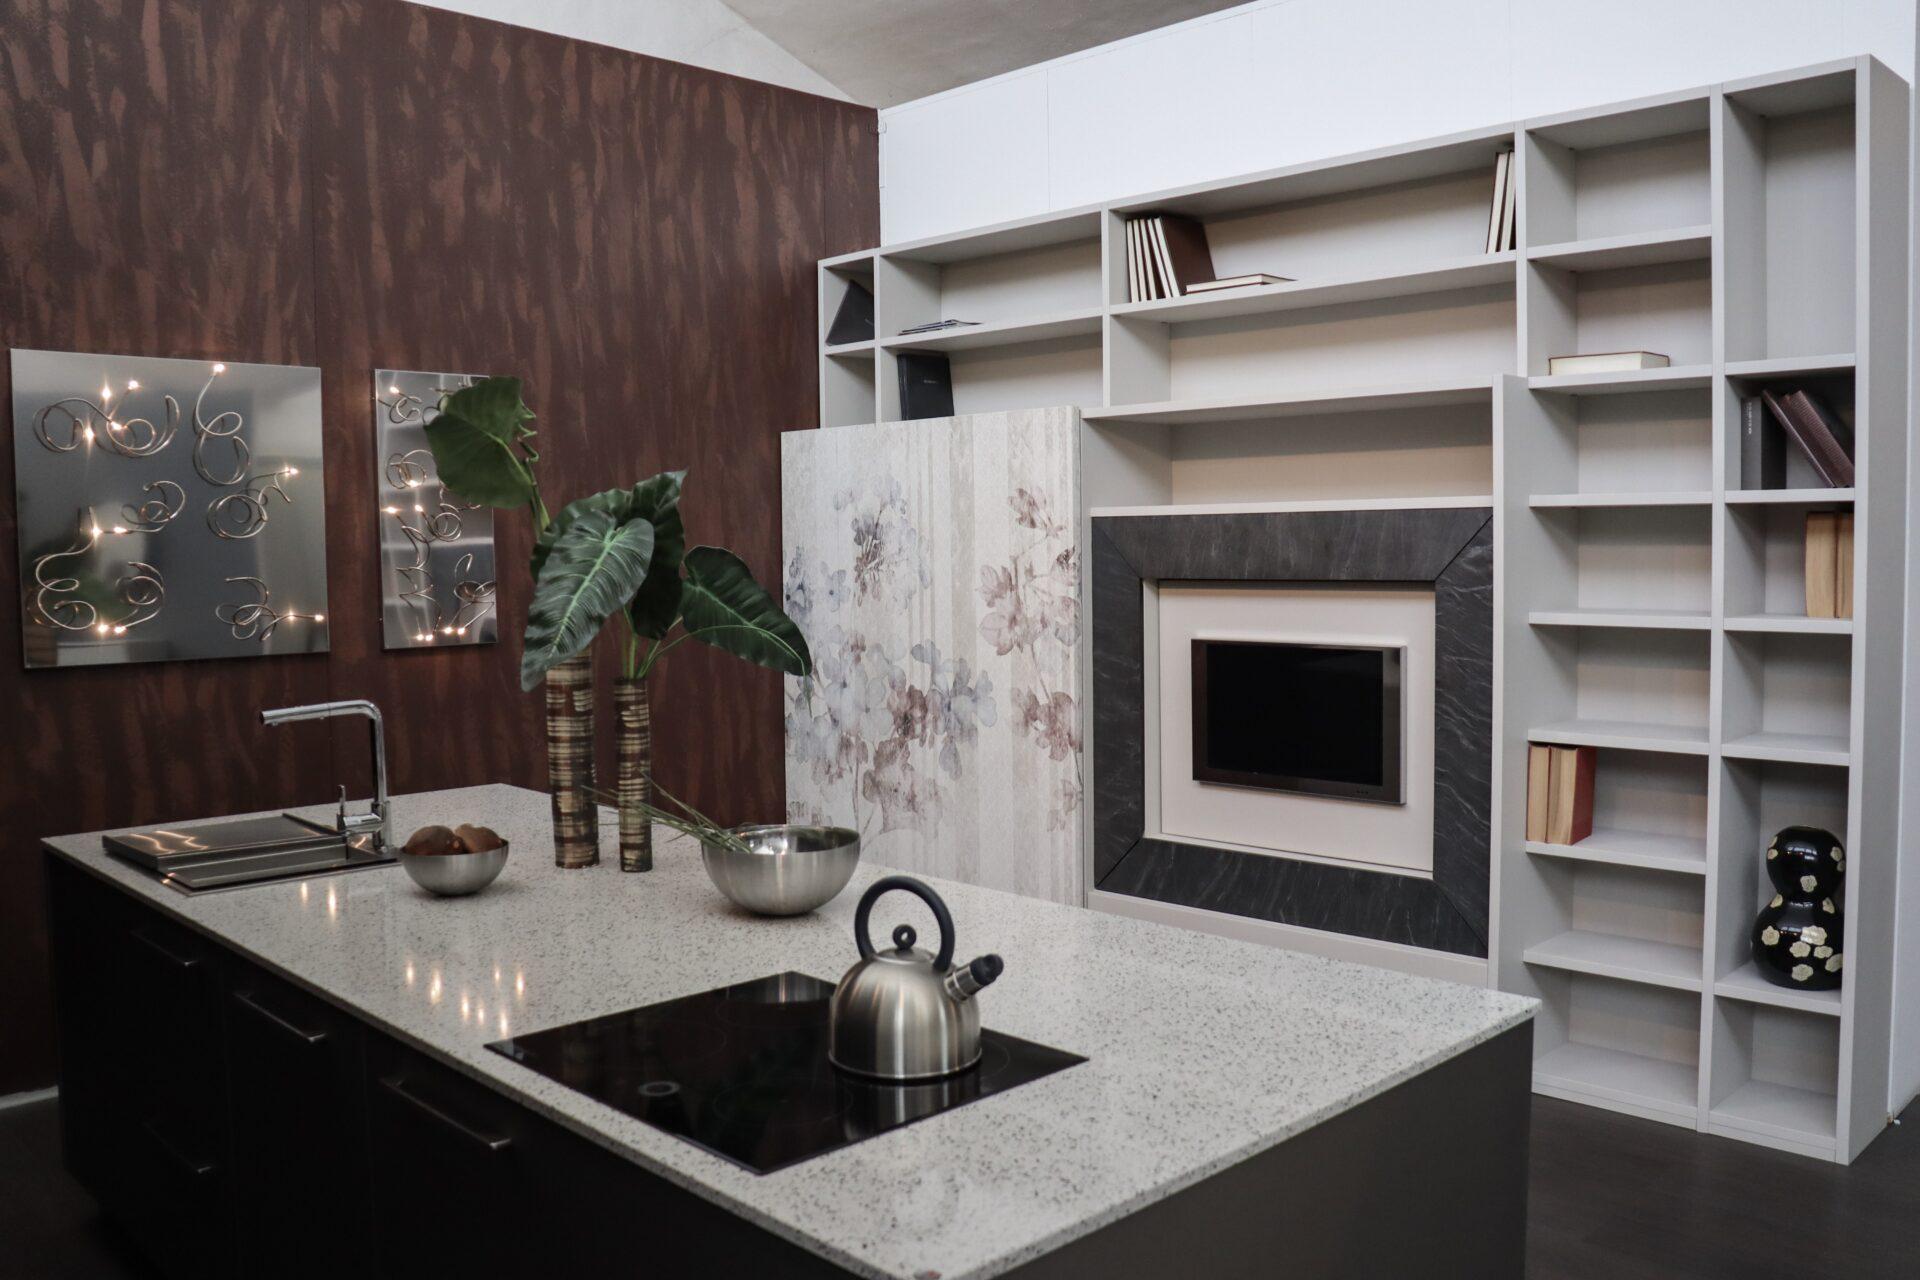 IMG 8478 Cucina libreria Loft